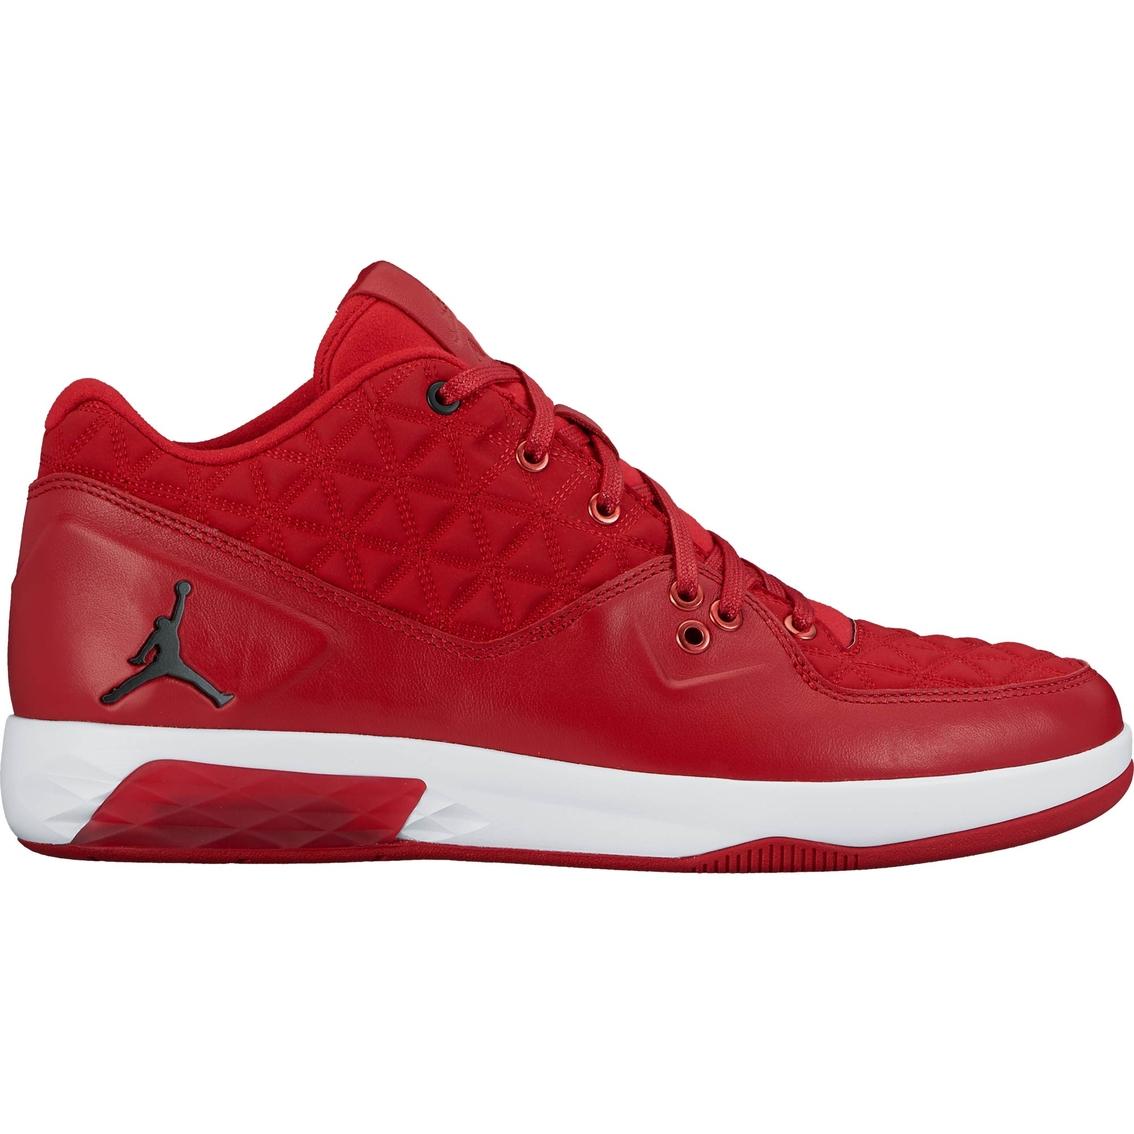 Jordan Sneakers Store Deutschland Jordan Clutch Schuhe für